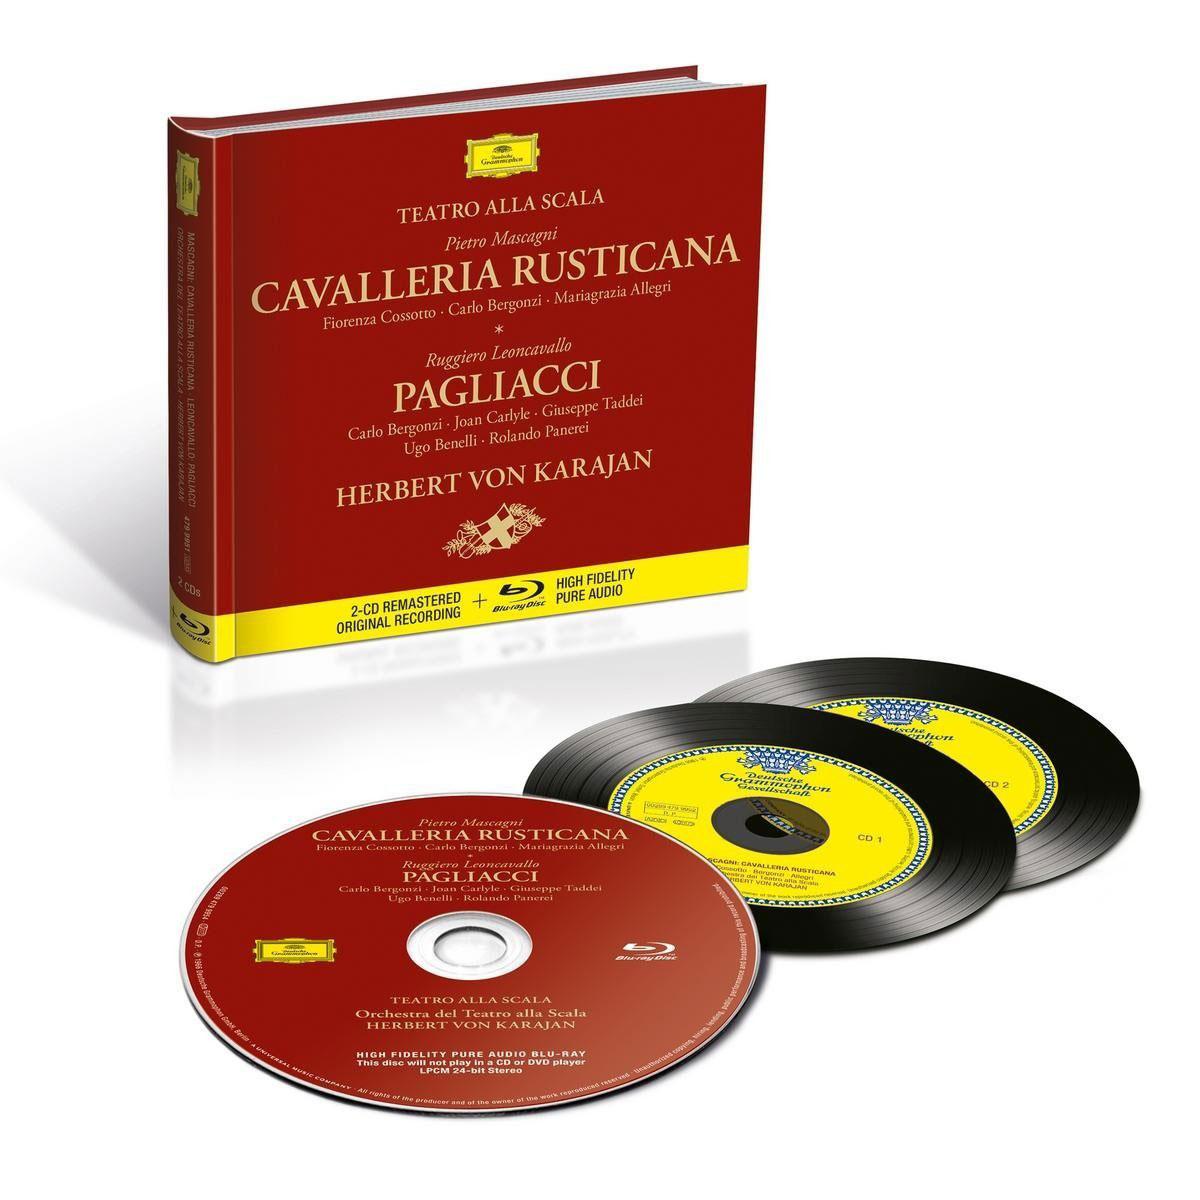 Herbert Von Karajan. Mascagni: Cavalleria Rusticana / Leoncavallo: Pagliacci (2 CD + Blu-ray) verdi herbert von karajan messa da requiem